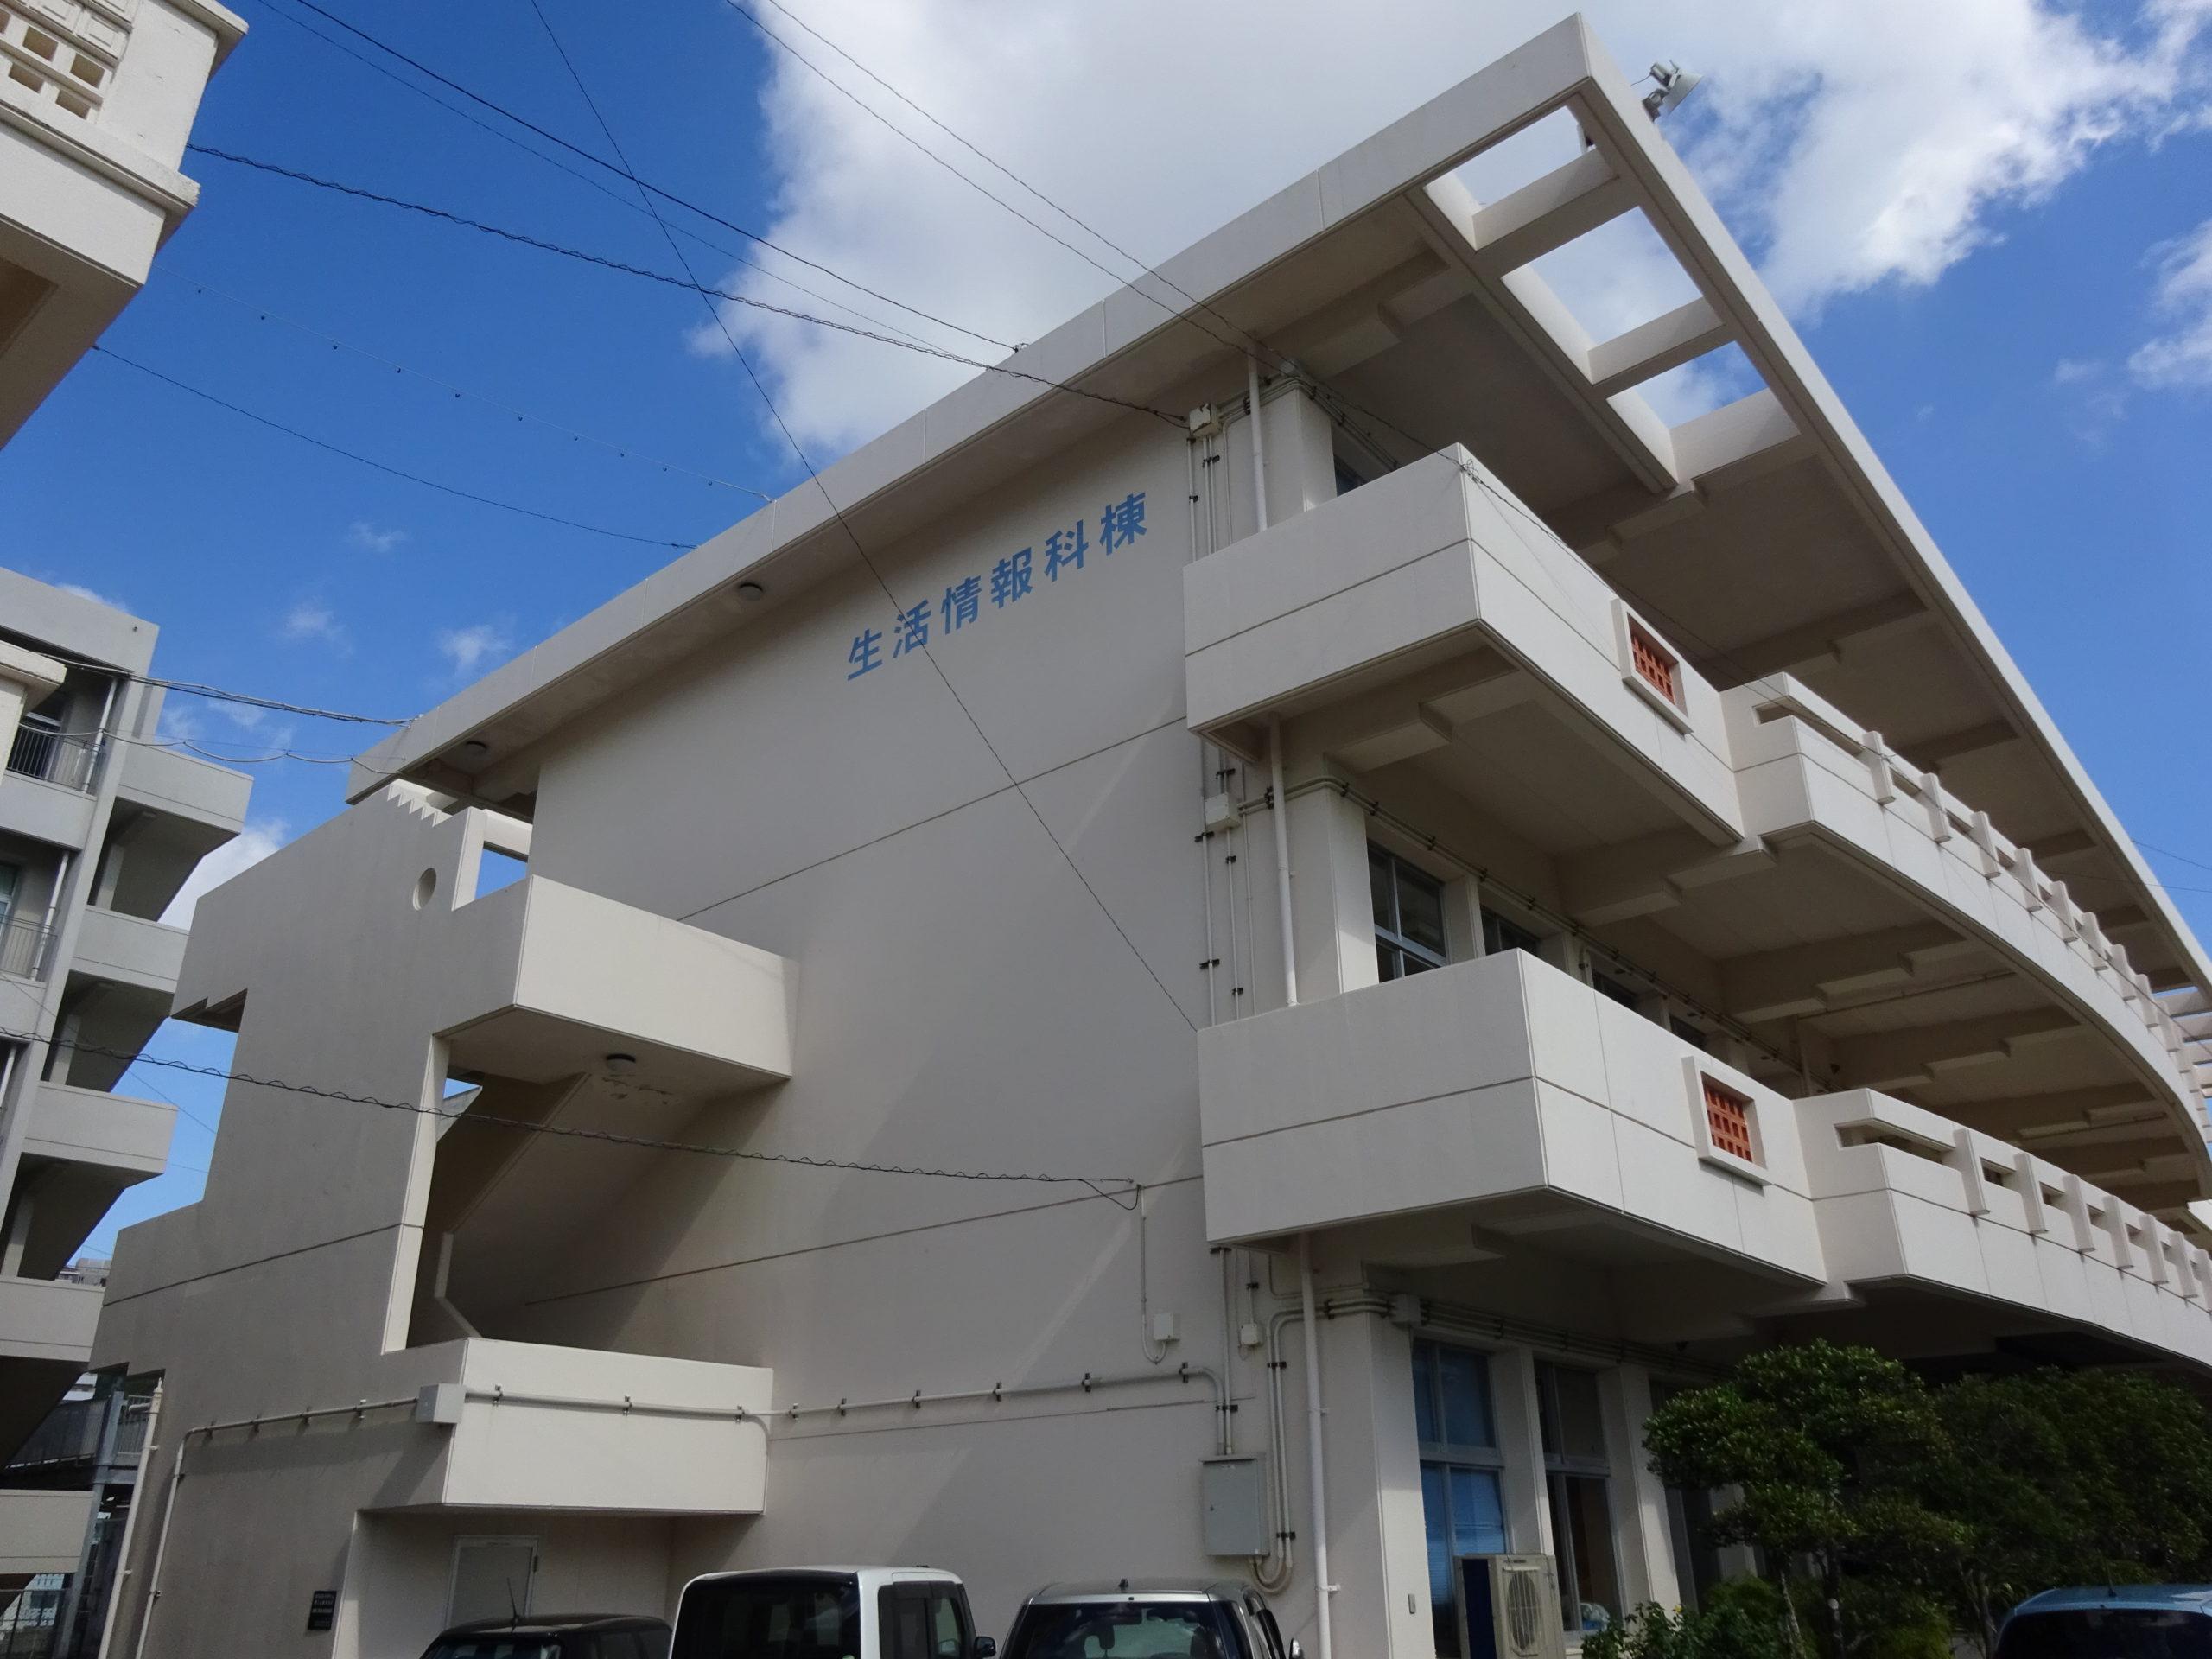 沖縄工業高校_A生活情報科メイン画像-scaled.jpg